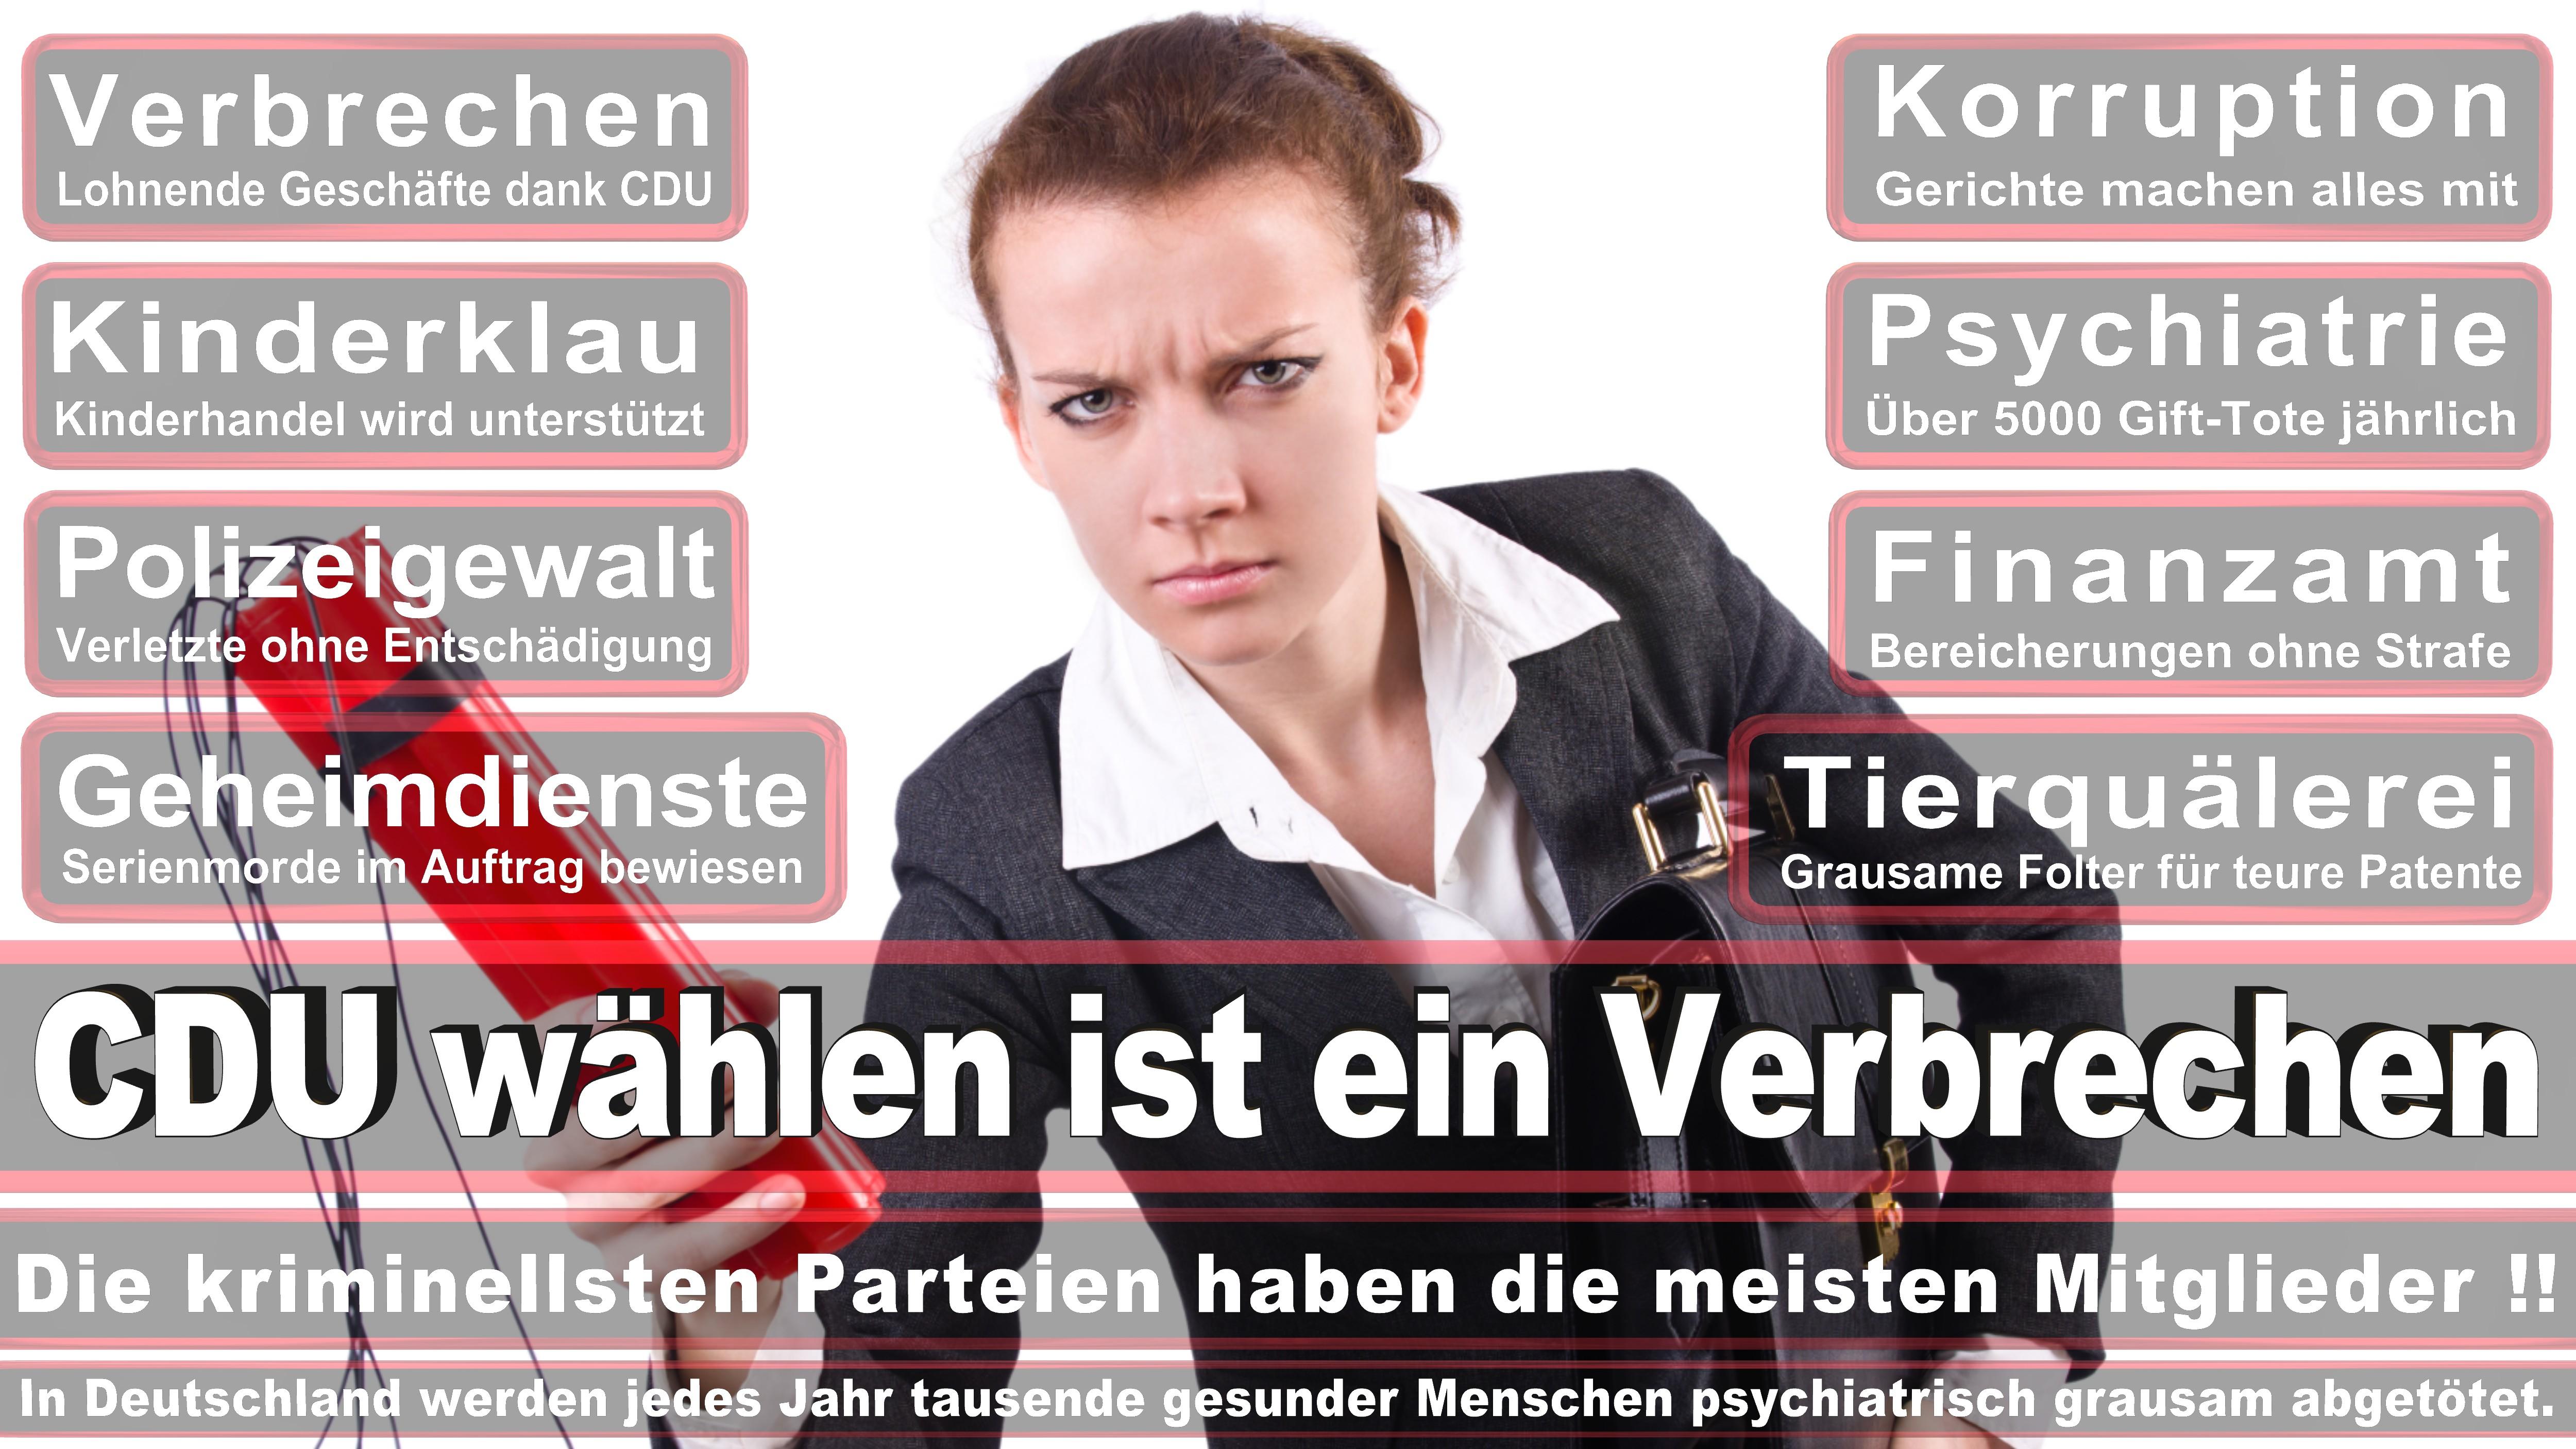 Petra Hinz Politiker Deutschland